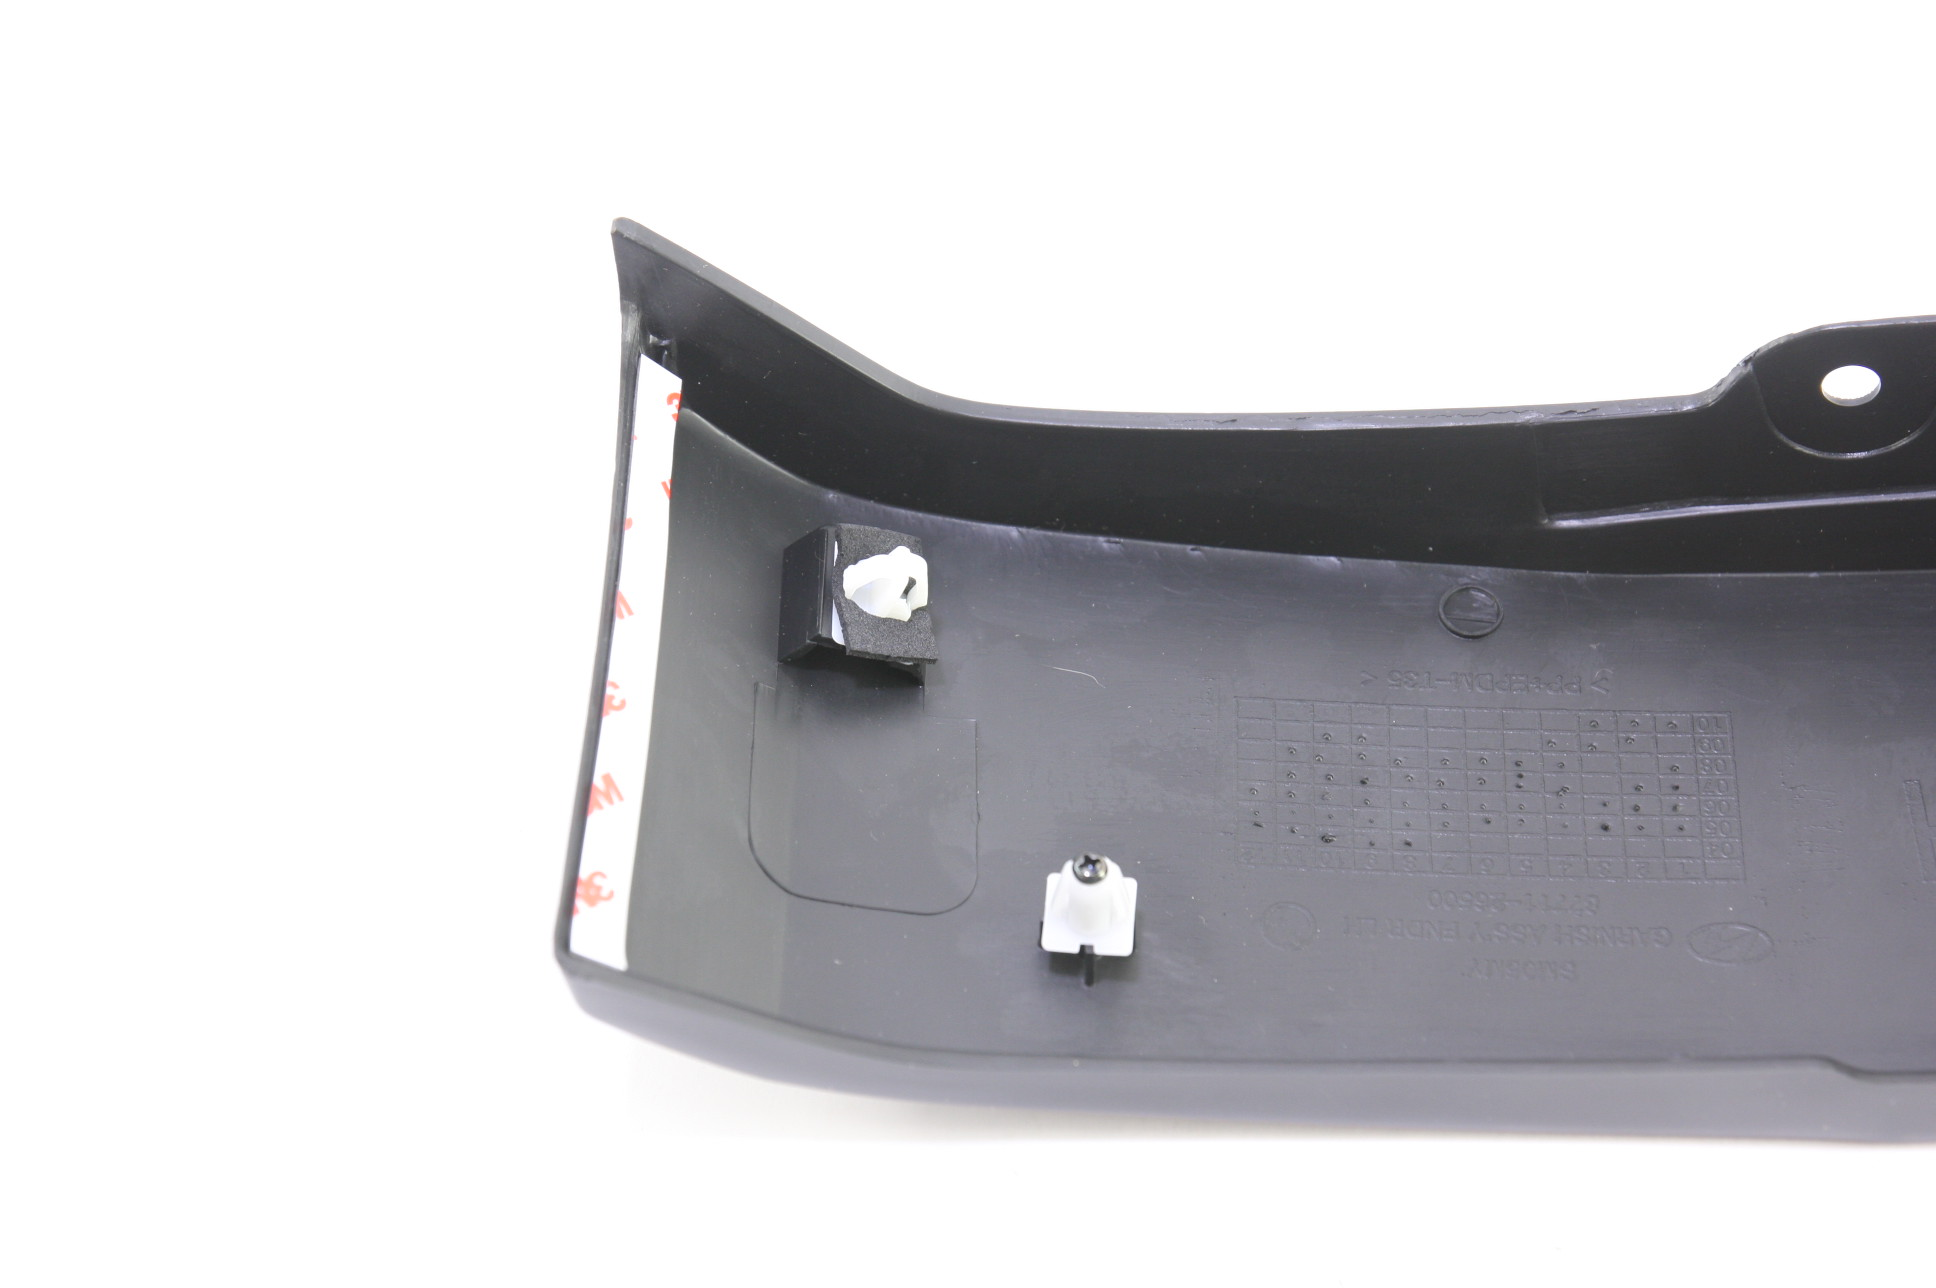 *~ New OEM Hyundai 8771126500 Front LH Exterior Fender Moulding 05-06 Santa Fe - image 7